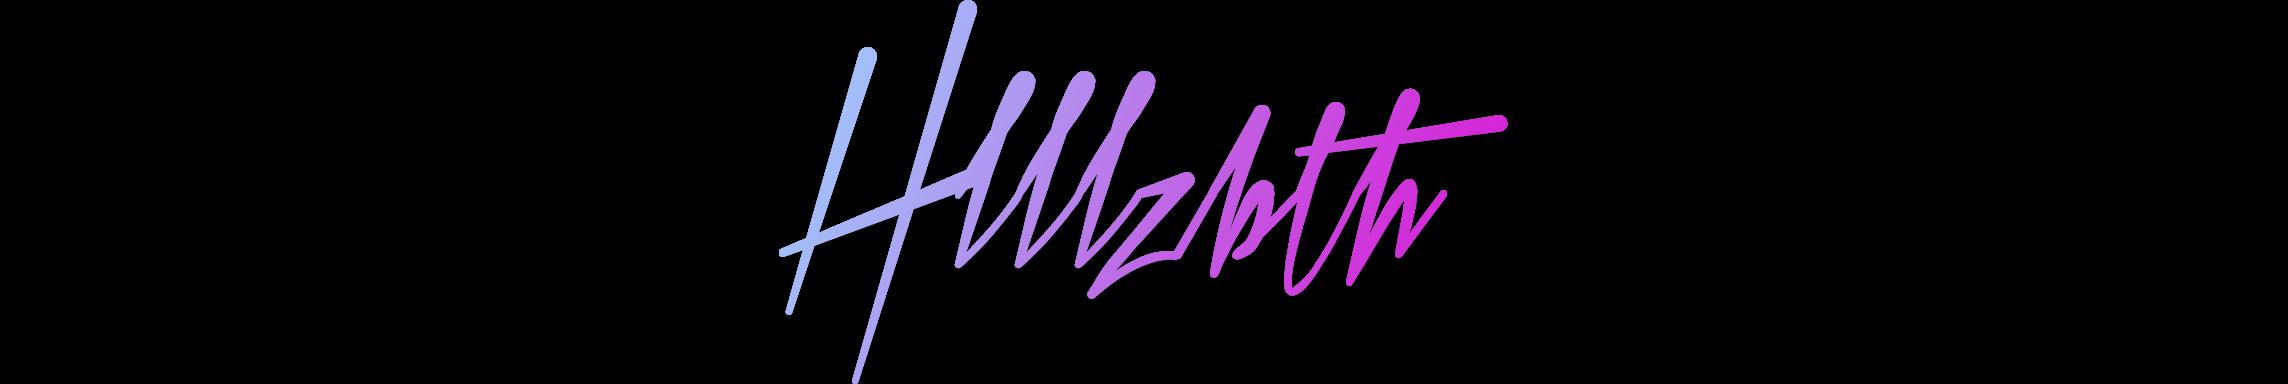 HLLLZBTH